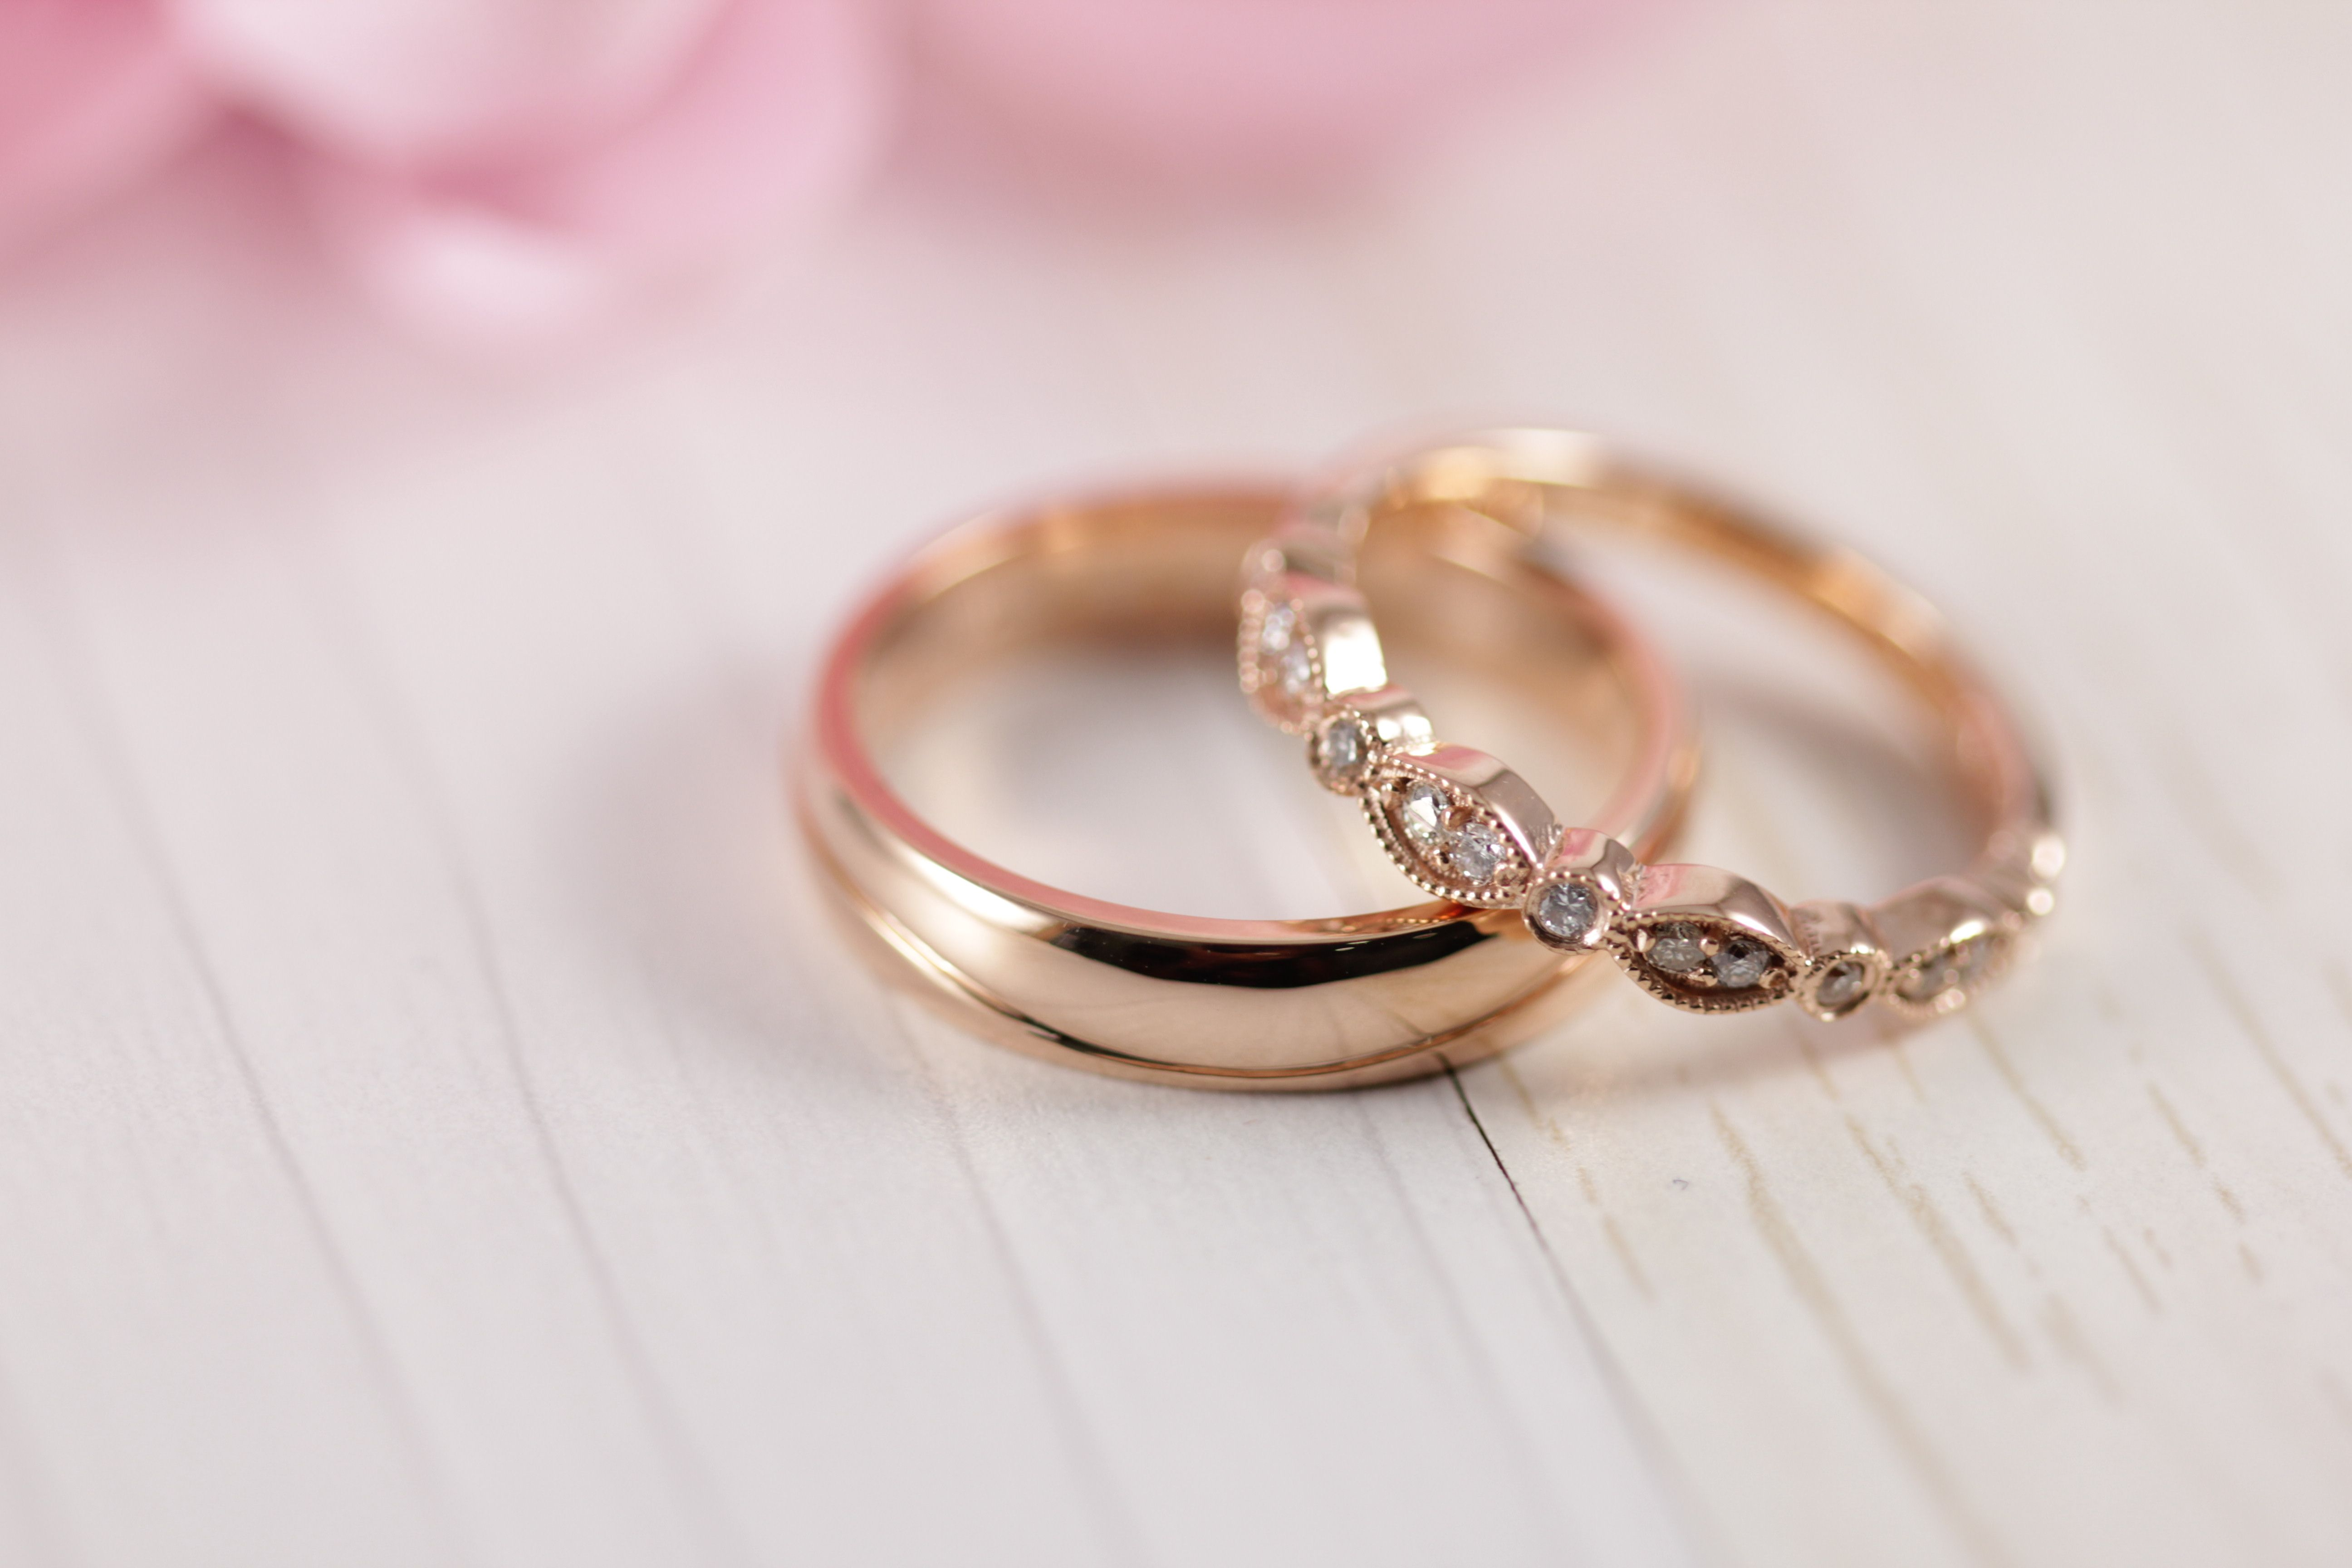 b435aa54dd19 Argolla de matrimonio lisa y churumbela con diamantes